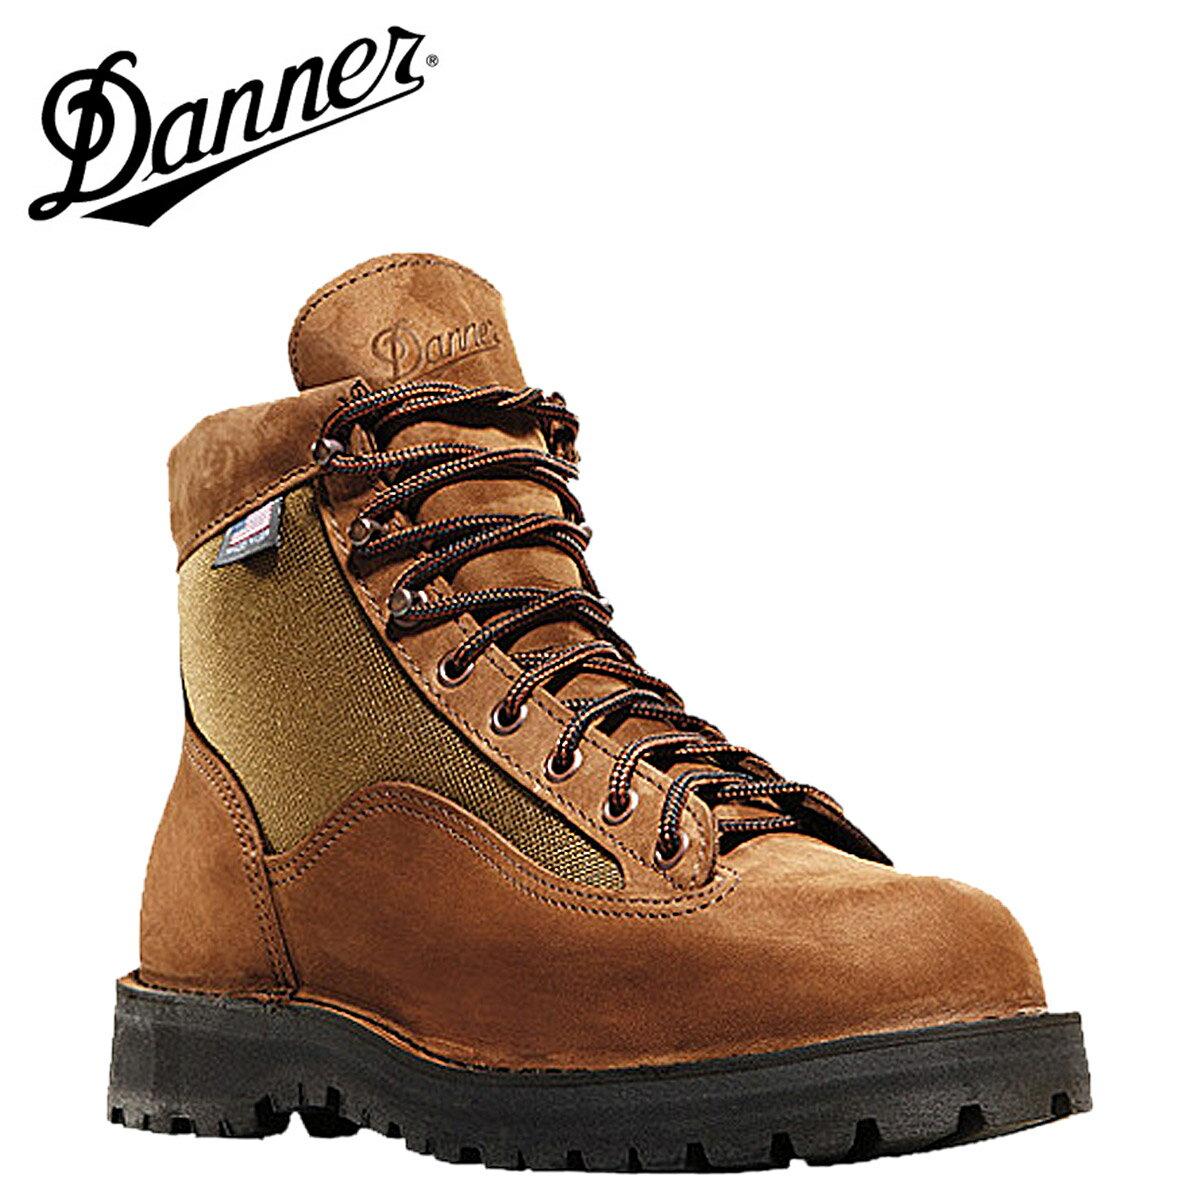 DANNER/ダナー ダナーライト2